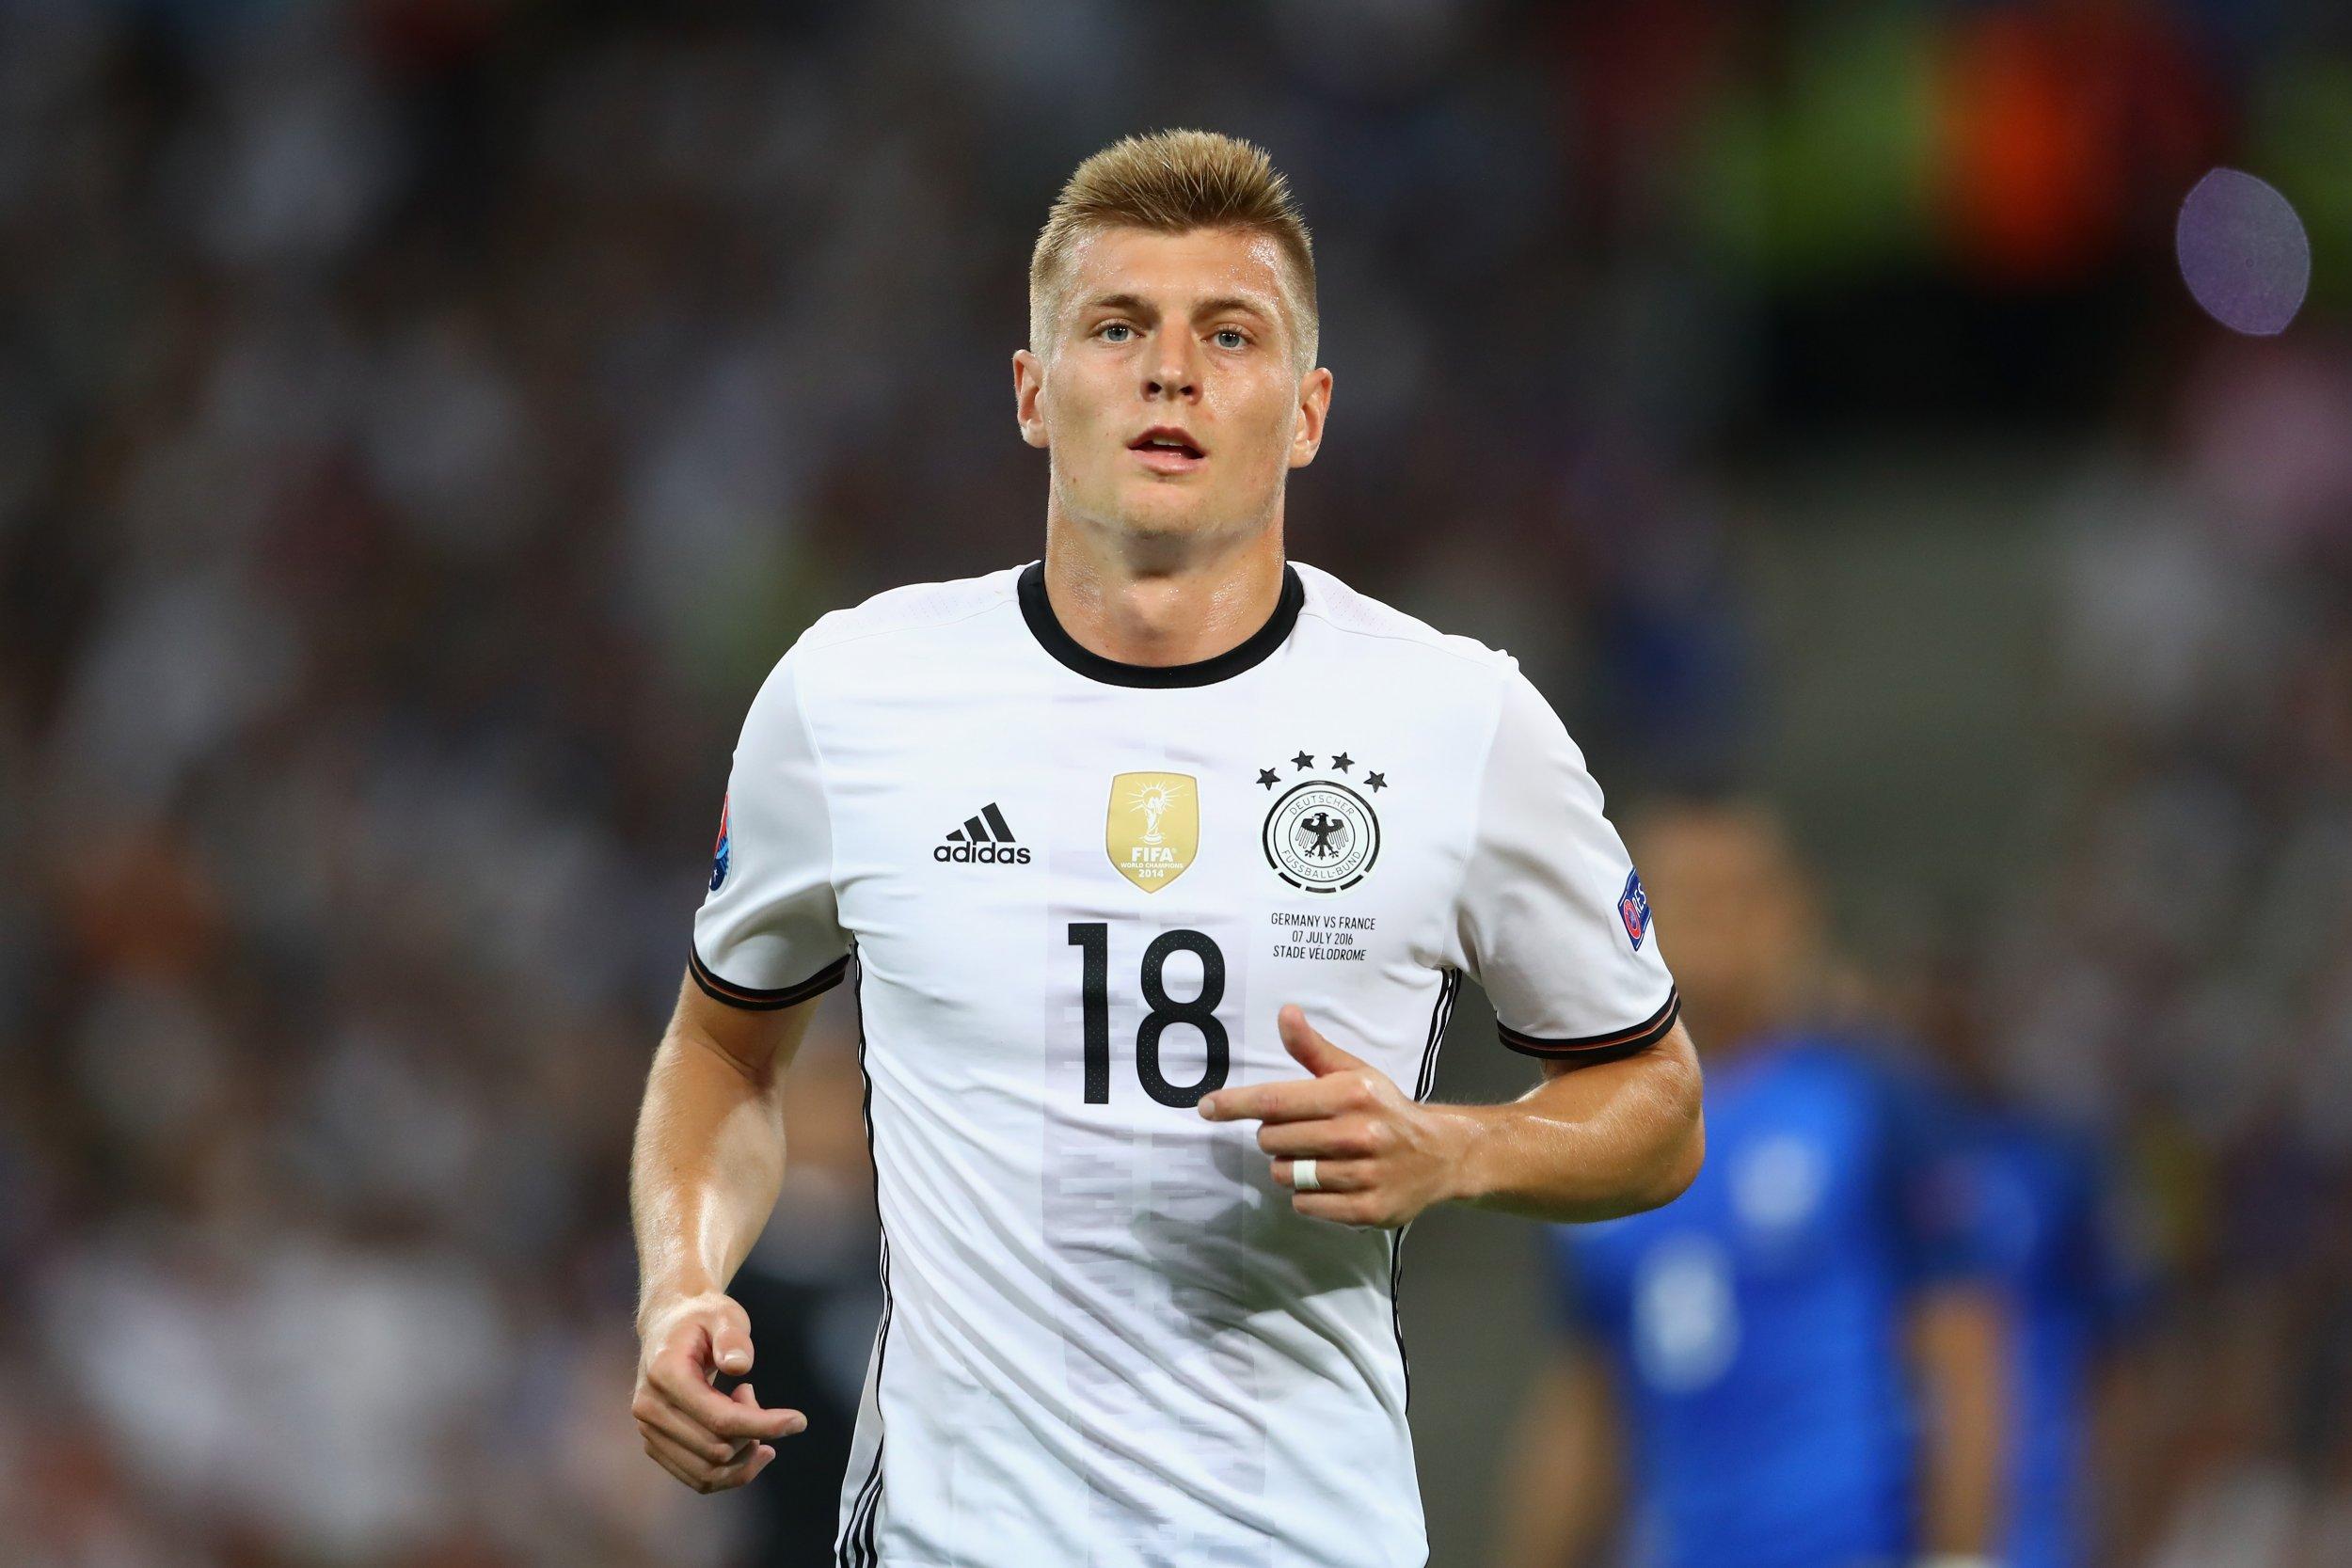 Germany and Real Madrid midfielder Toni Kroos